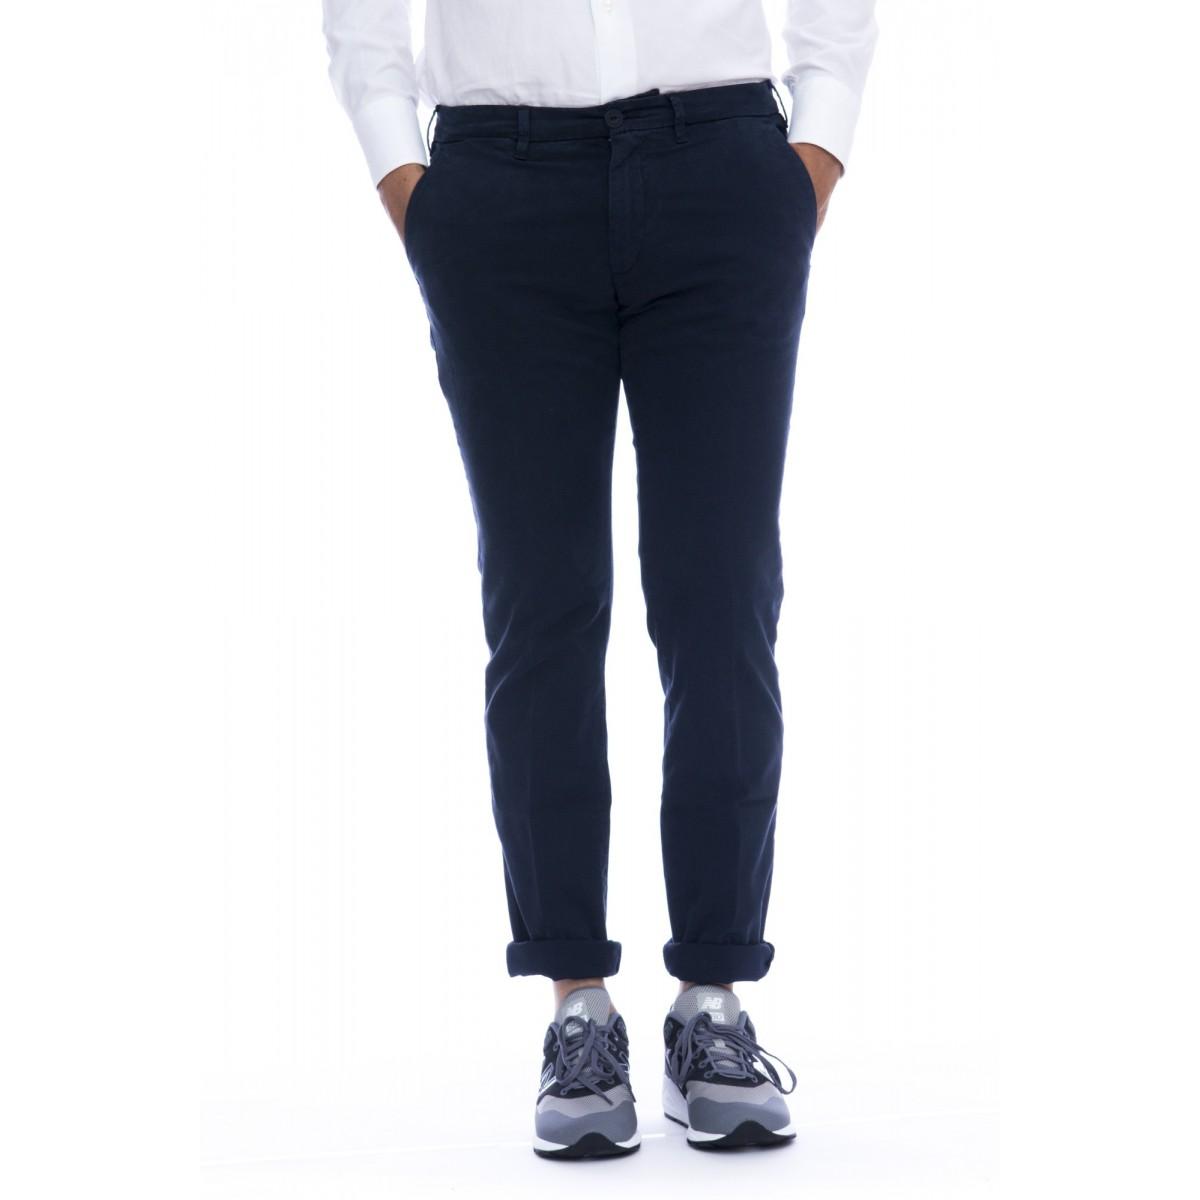 Pantalone uomo 40 weft - Lenny 8760 lavorato